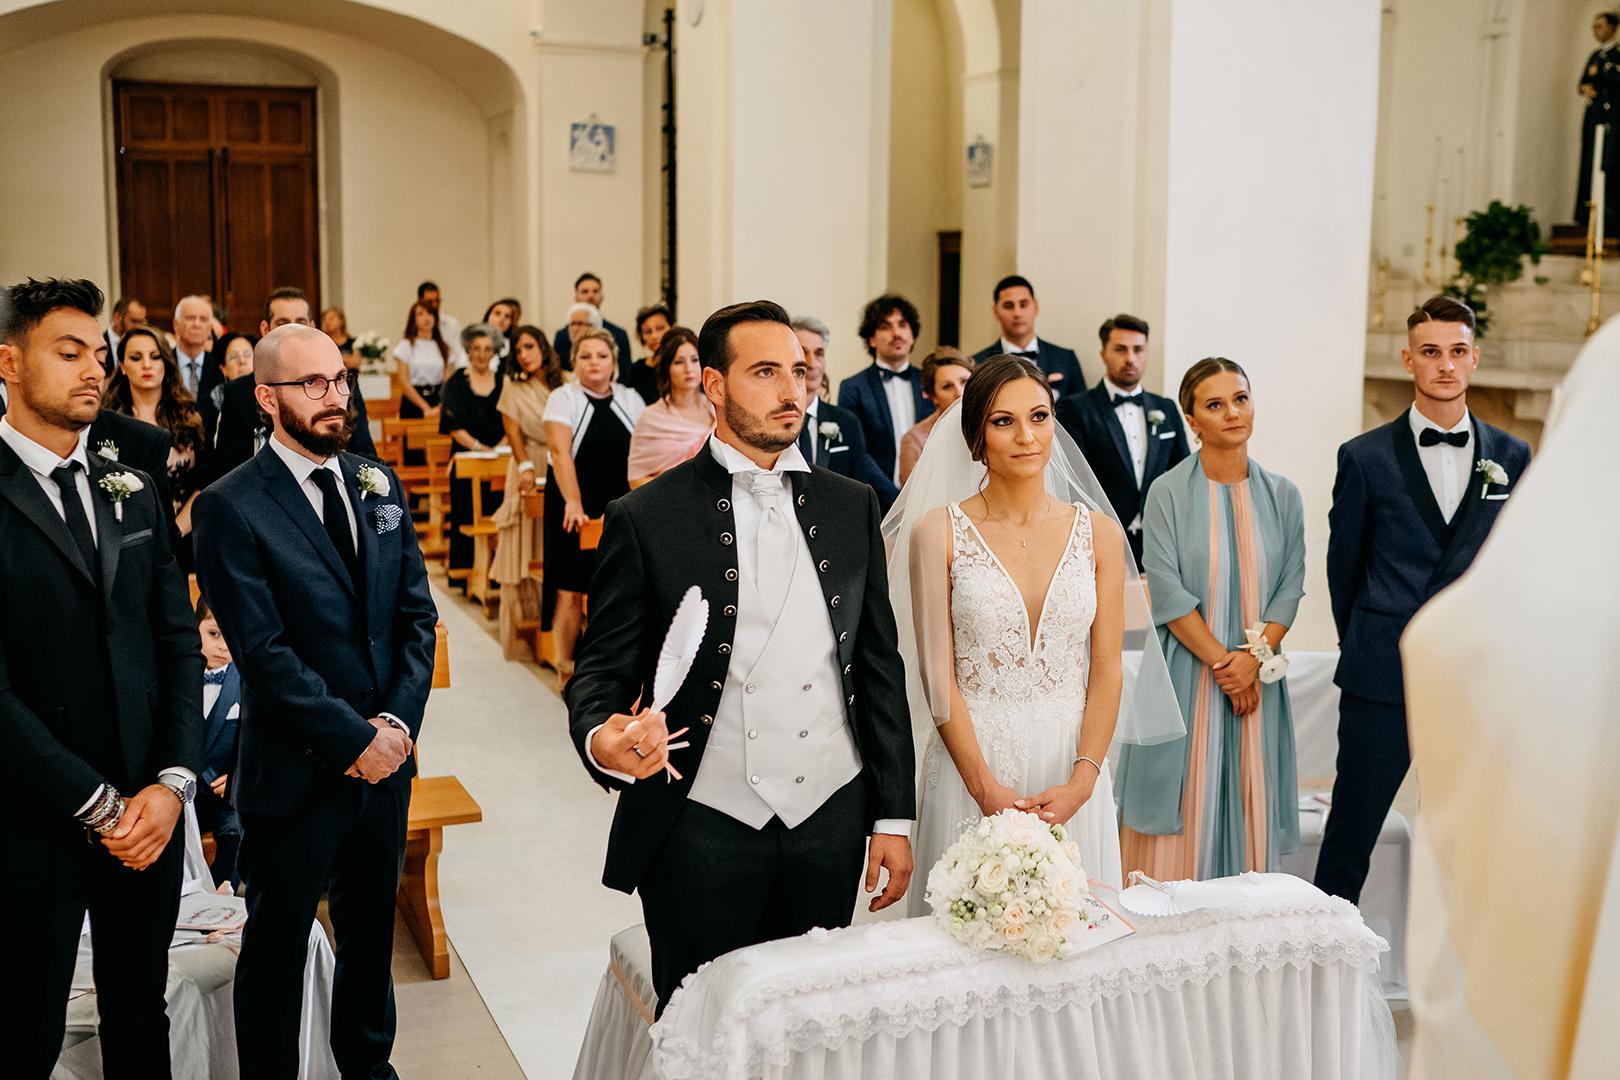 22 gianni-lepore-matrimonio-stornarella